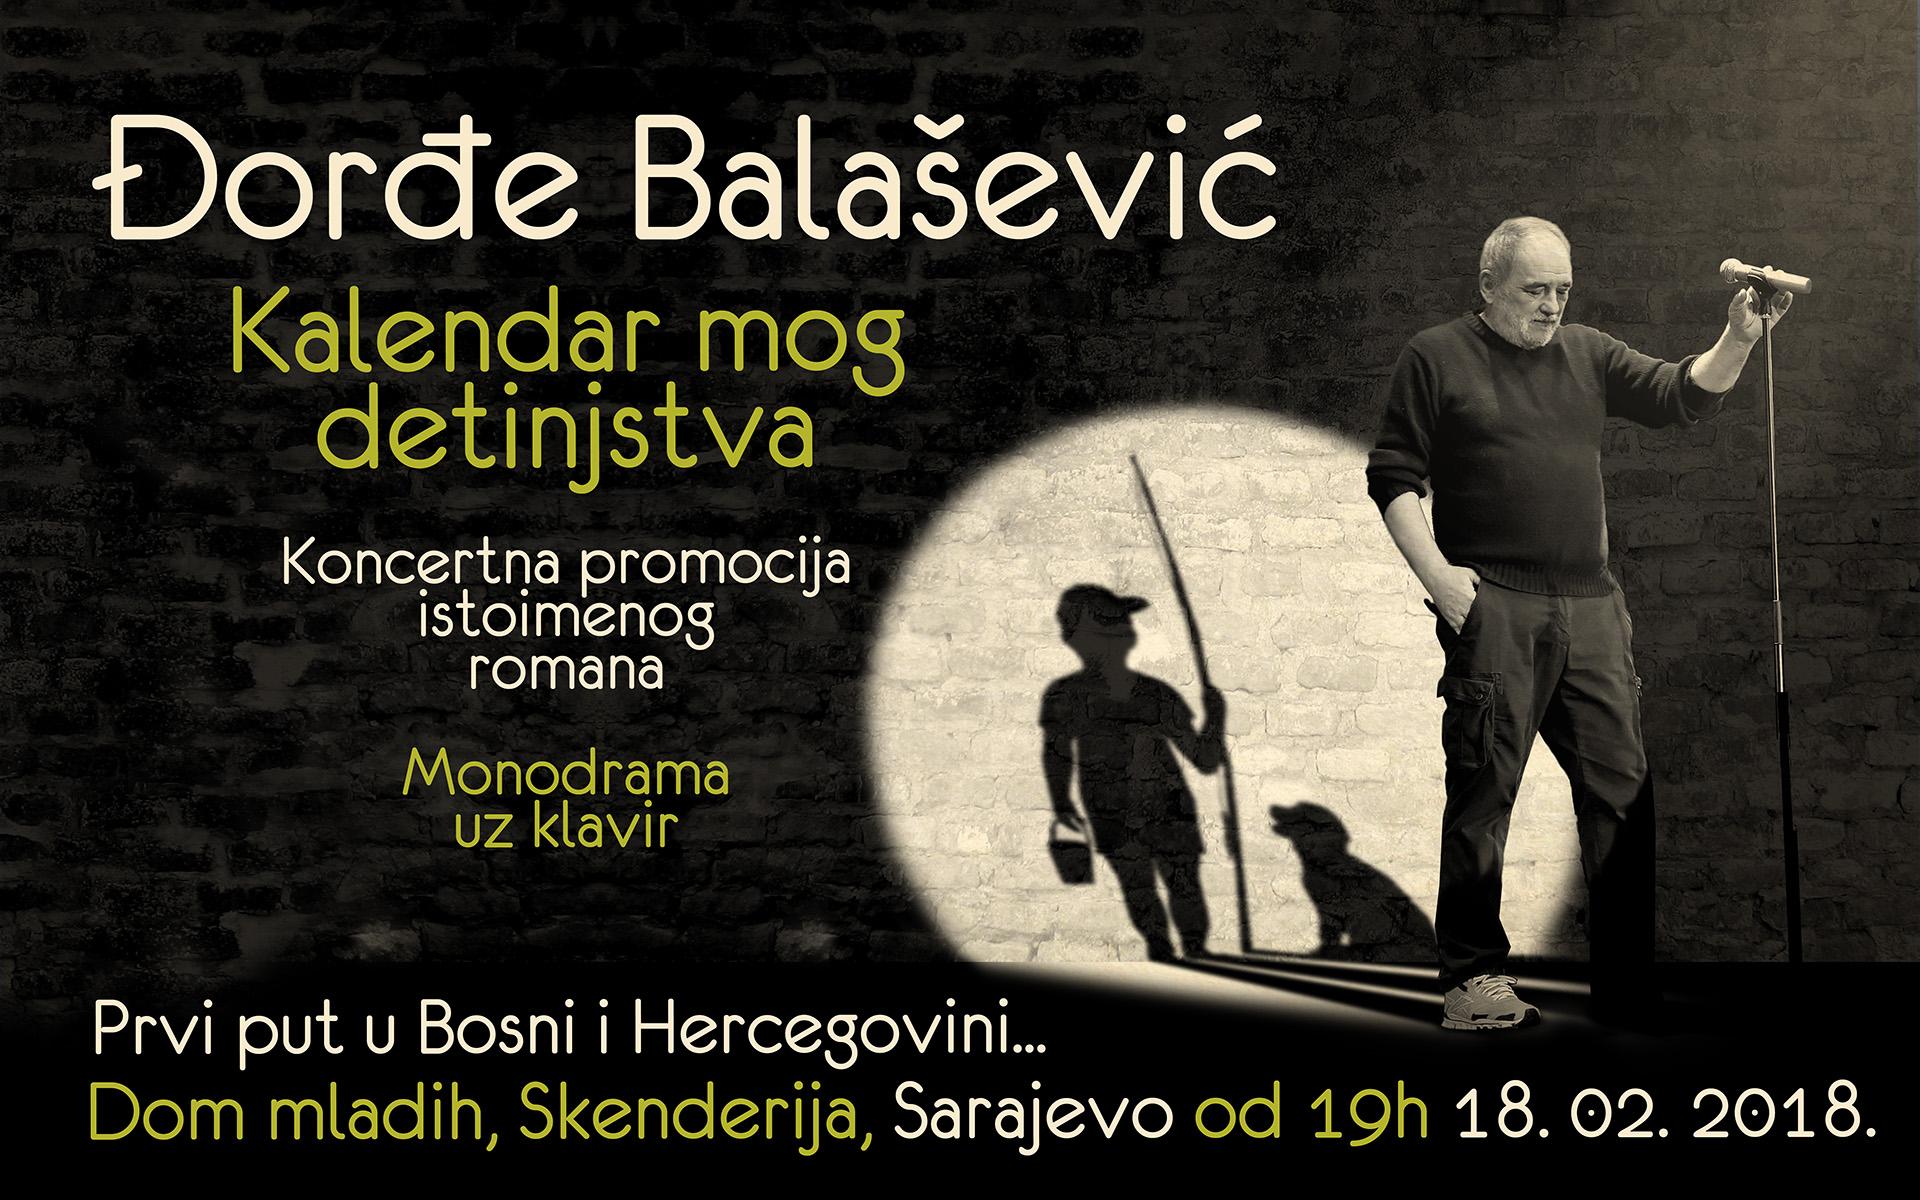 Prvi put u Bosni i Hercegovini